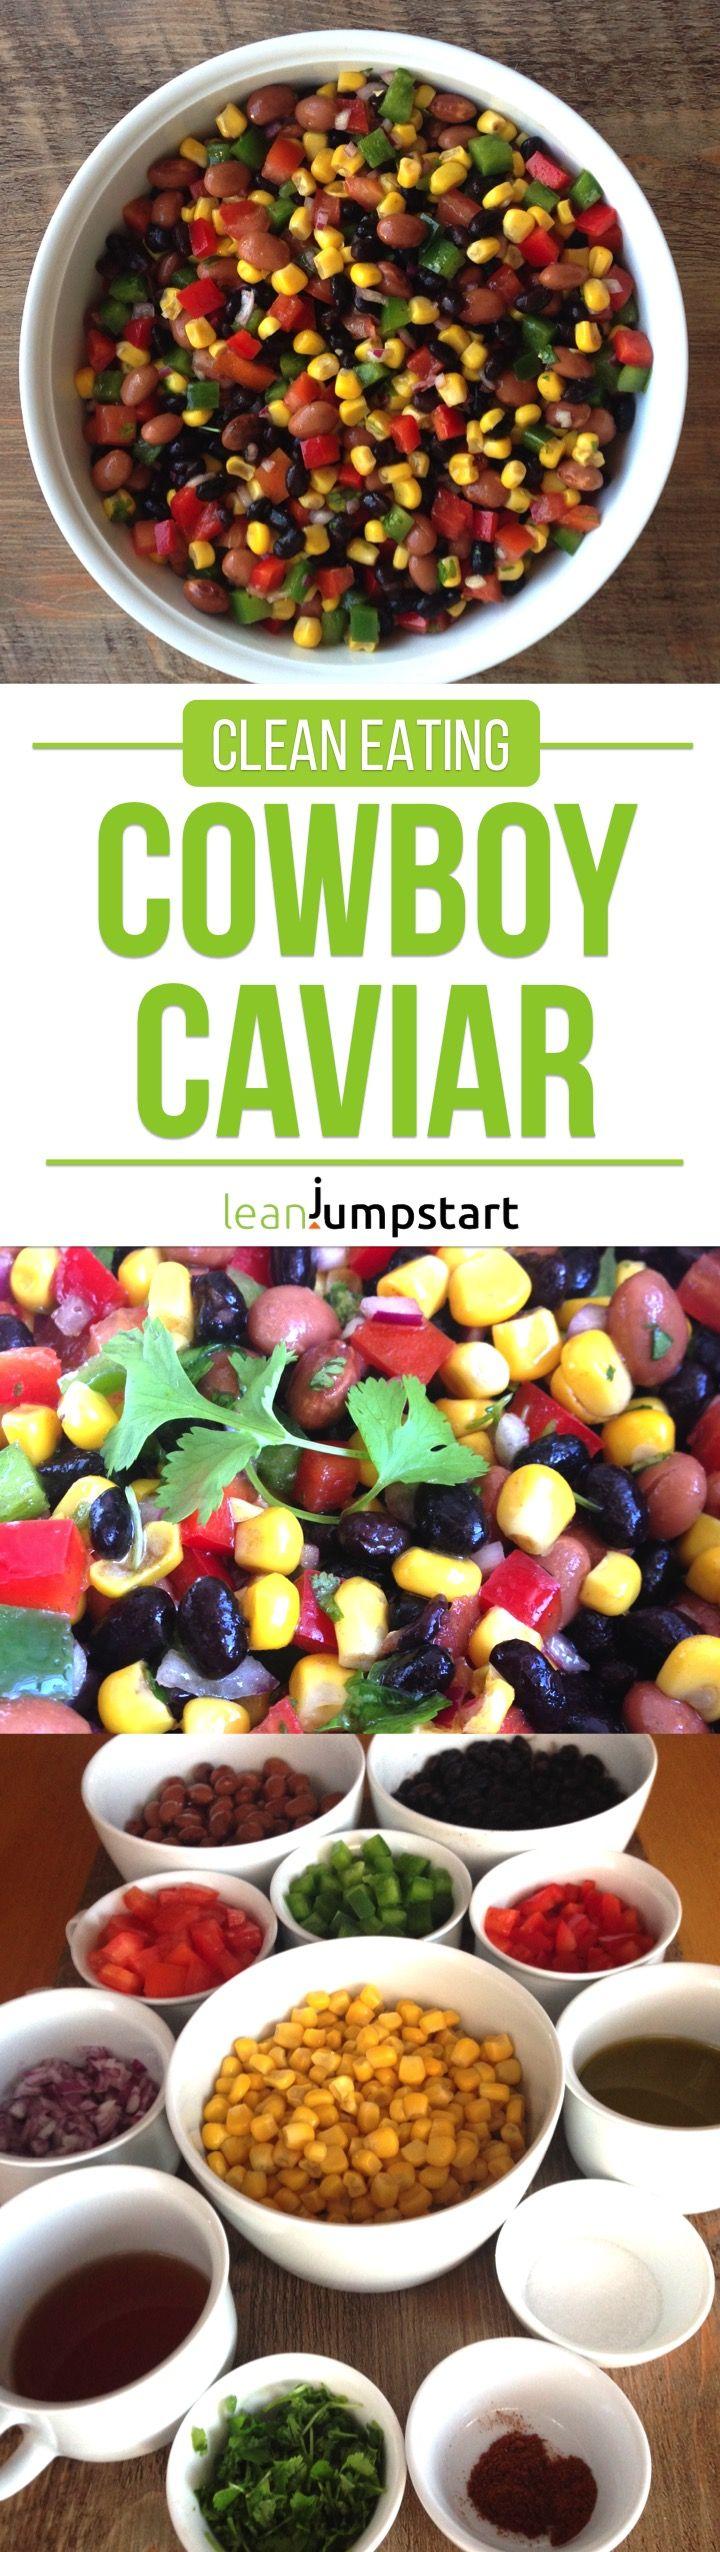 clean cowboy caviar - just plain good & easy bean salad, packed with colorful, fresh ingredients #cowboycaviar #cleaneating #newyear via @leanjumpstart #cowboycaviar